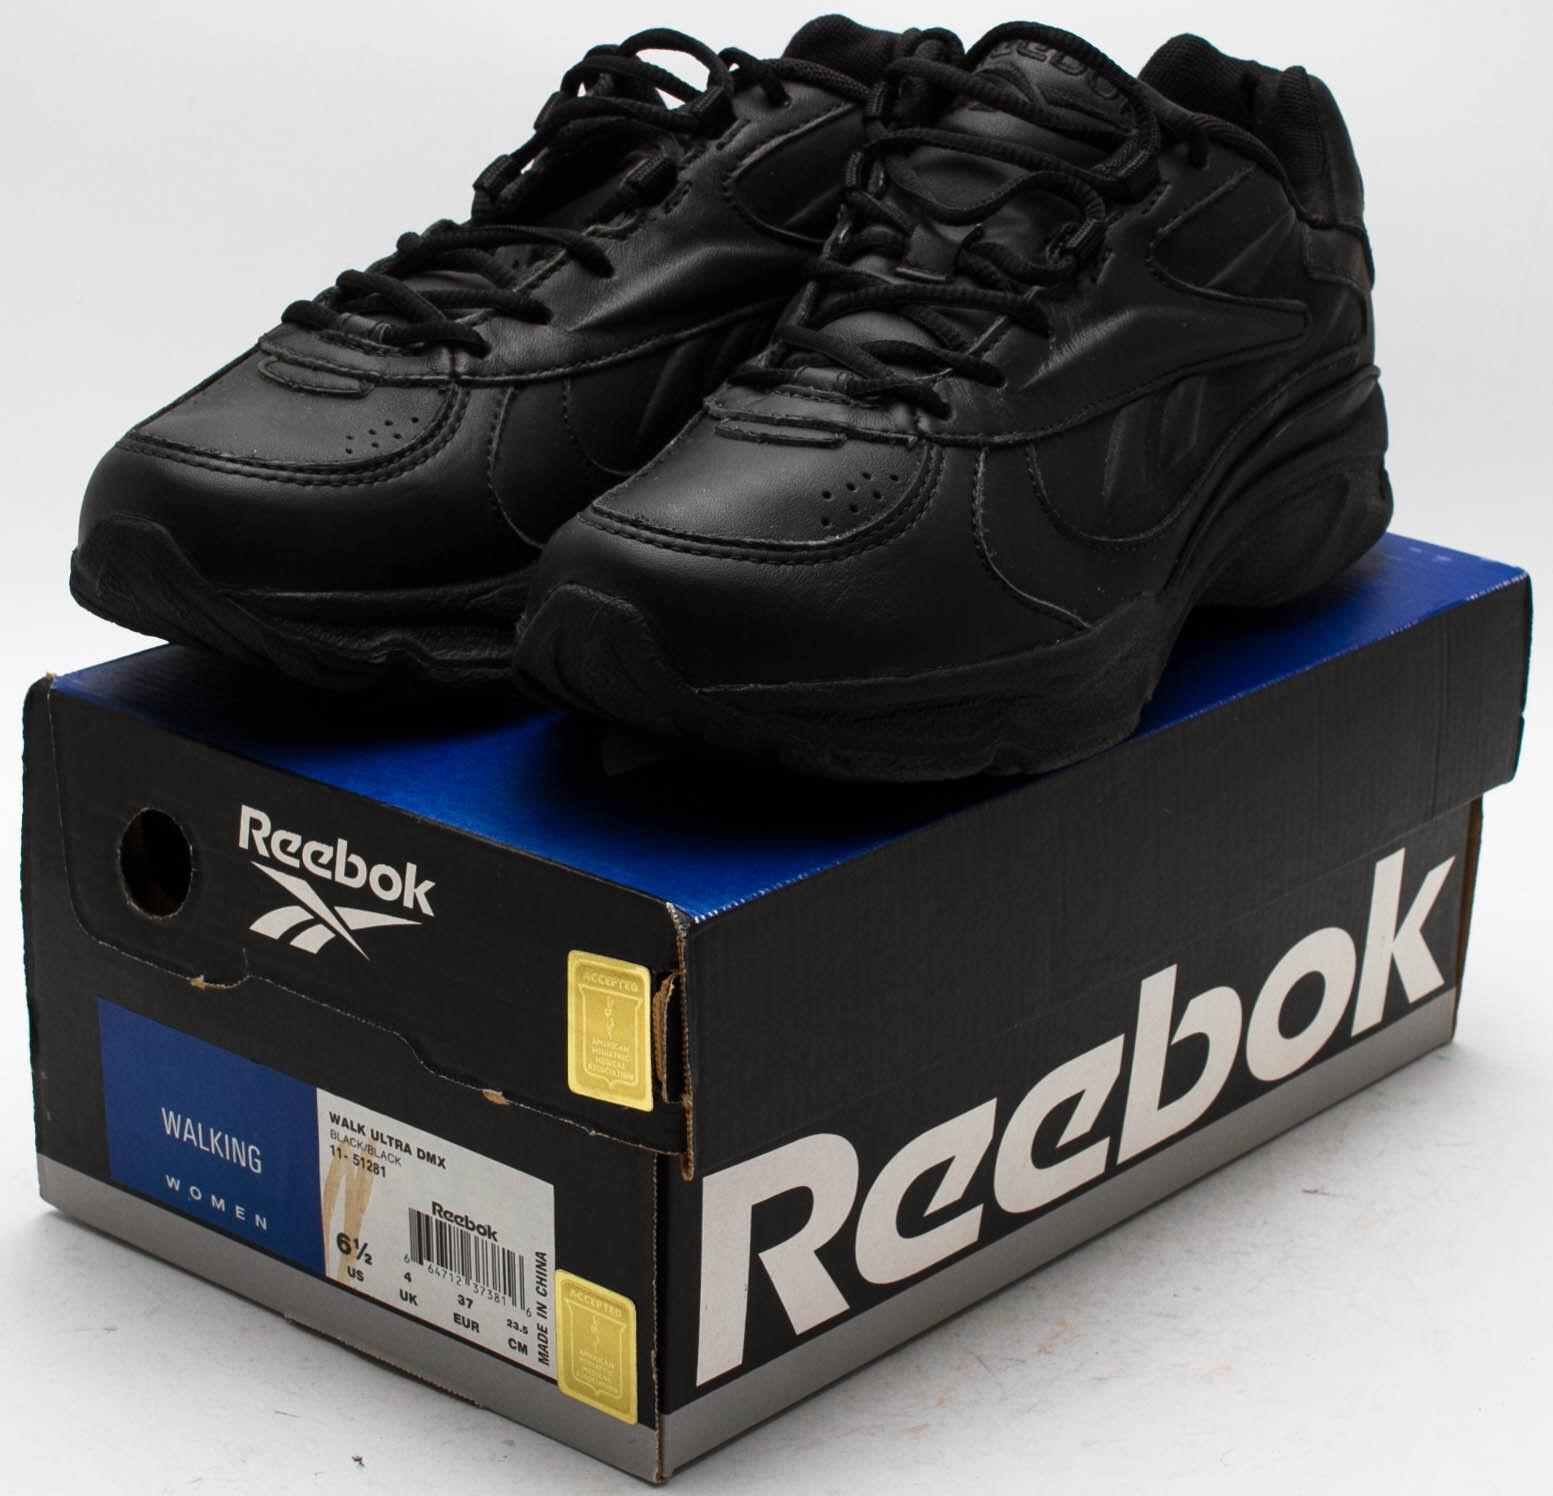 Reebok Damen DMX Vintage 607ms Walk Ultra DMX Damen Schuhe 11-51281 schwarz Größe 6.5 dde1d1